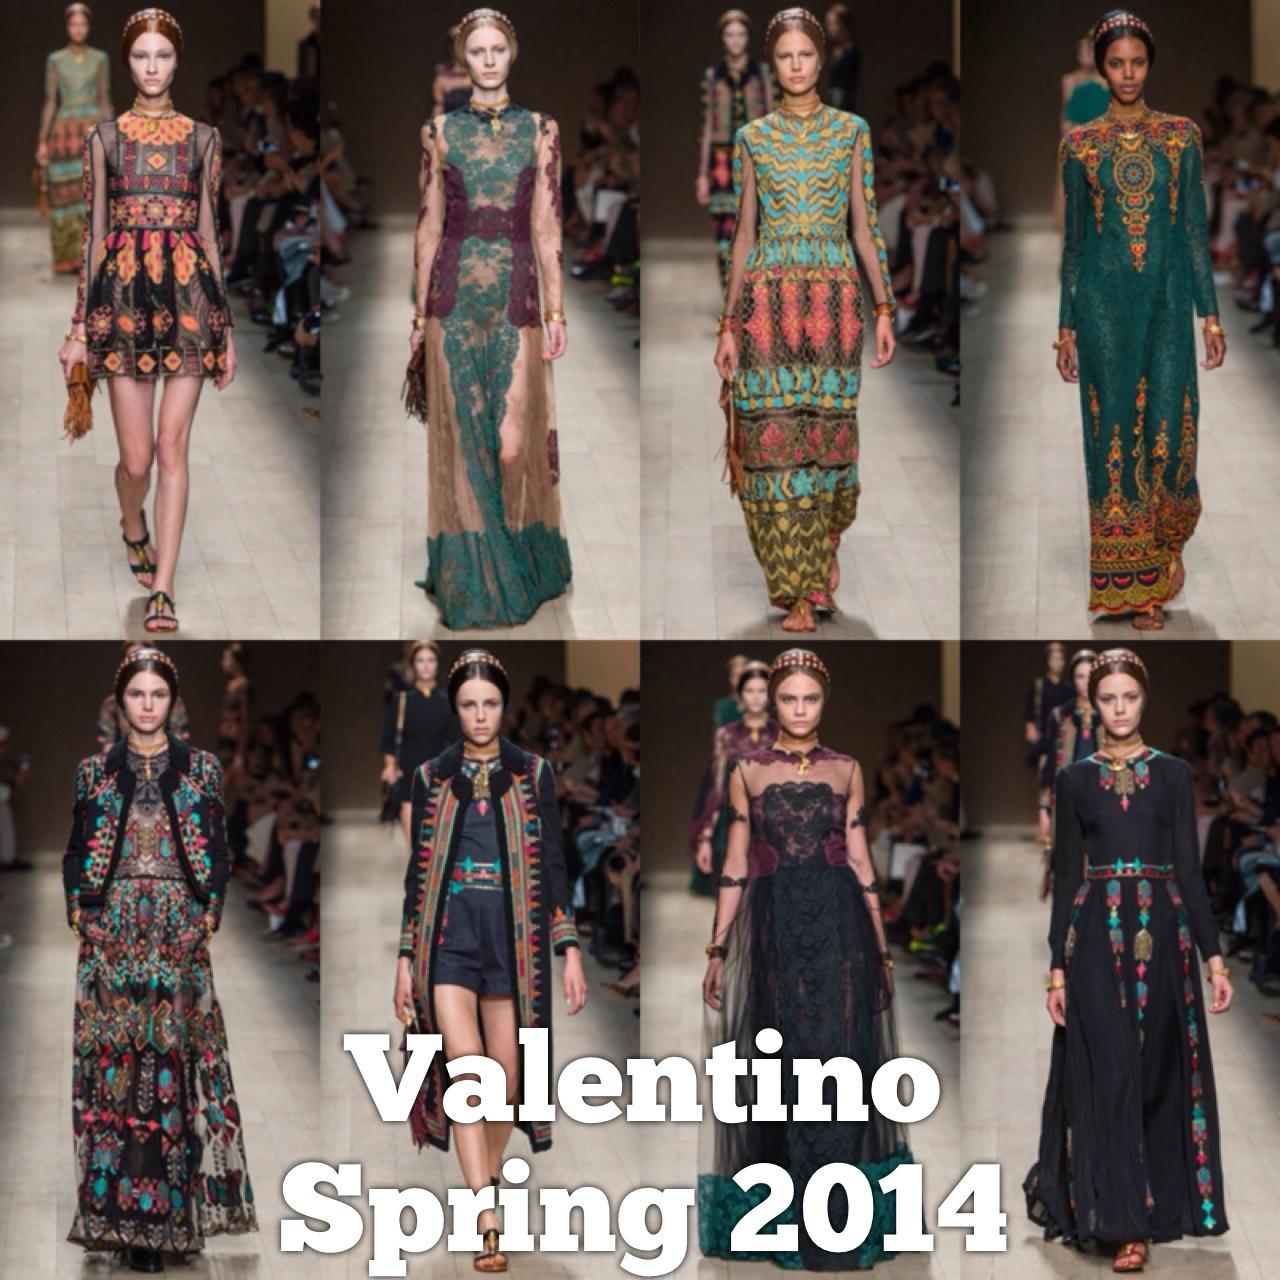 Spring 2014 Valentino